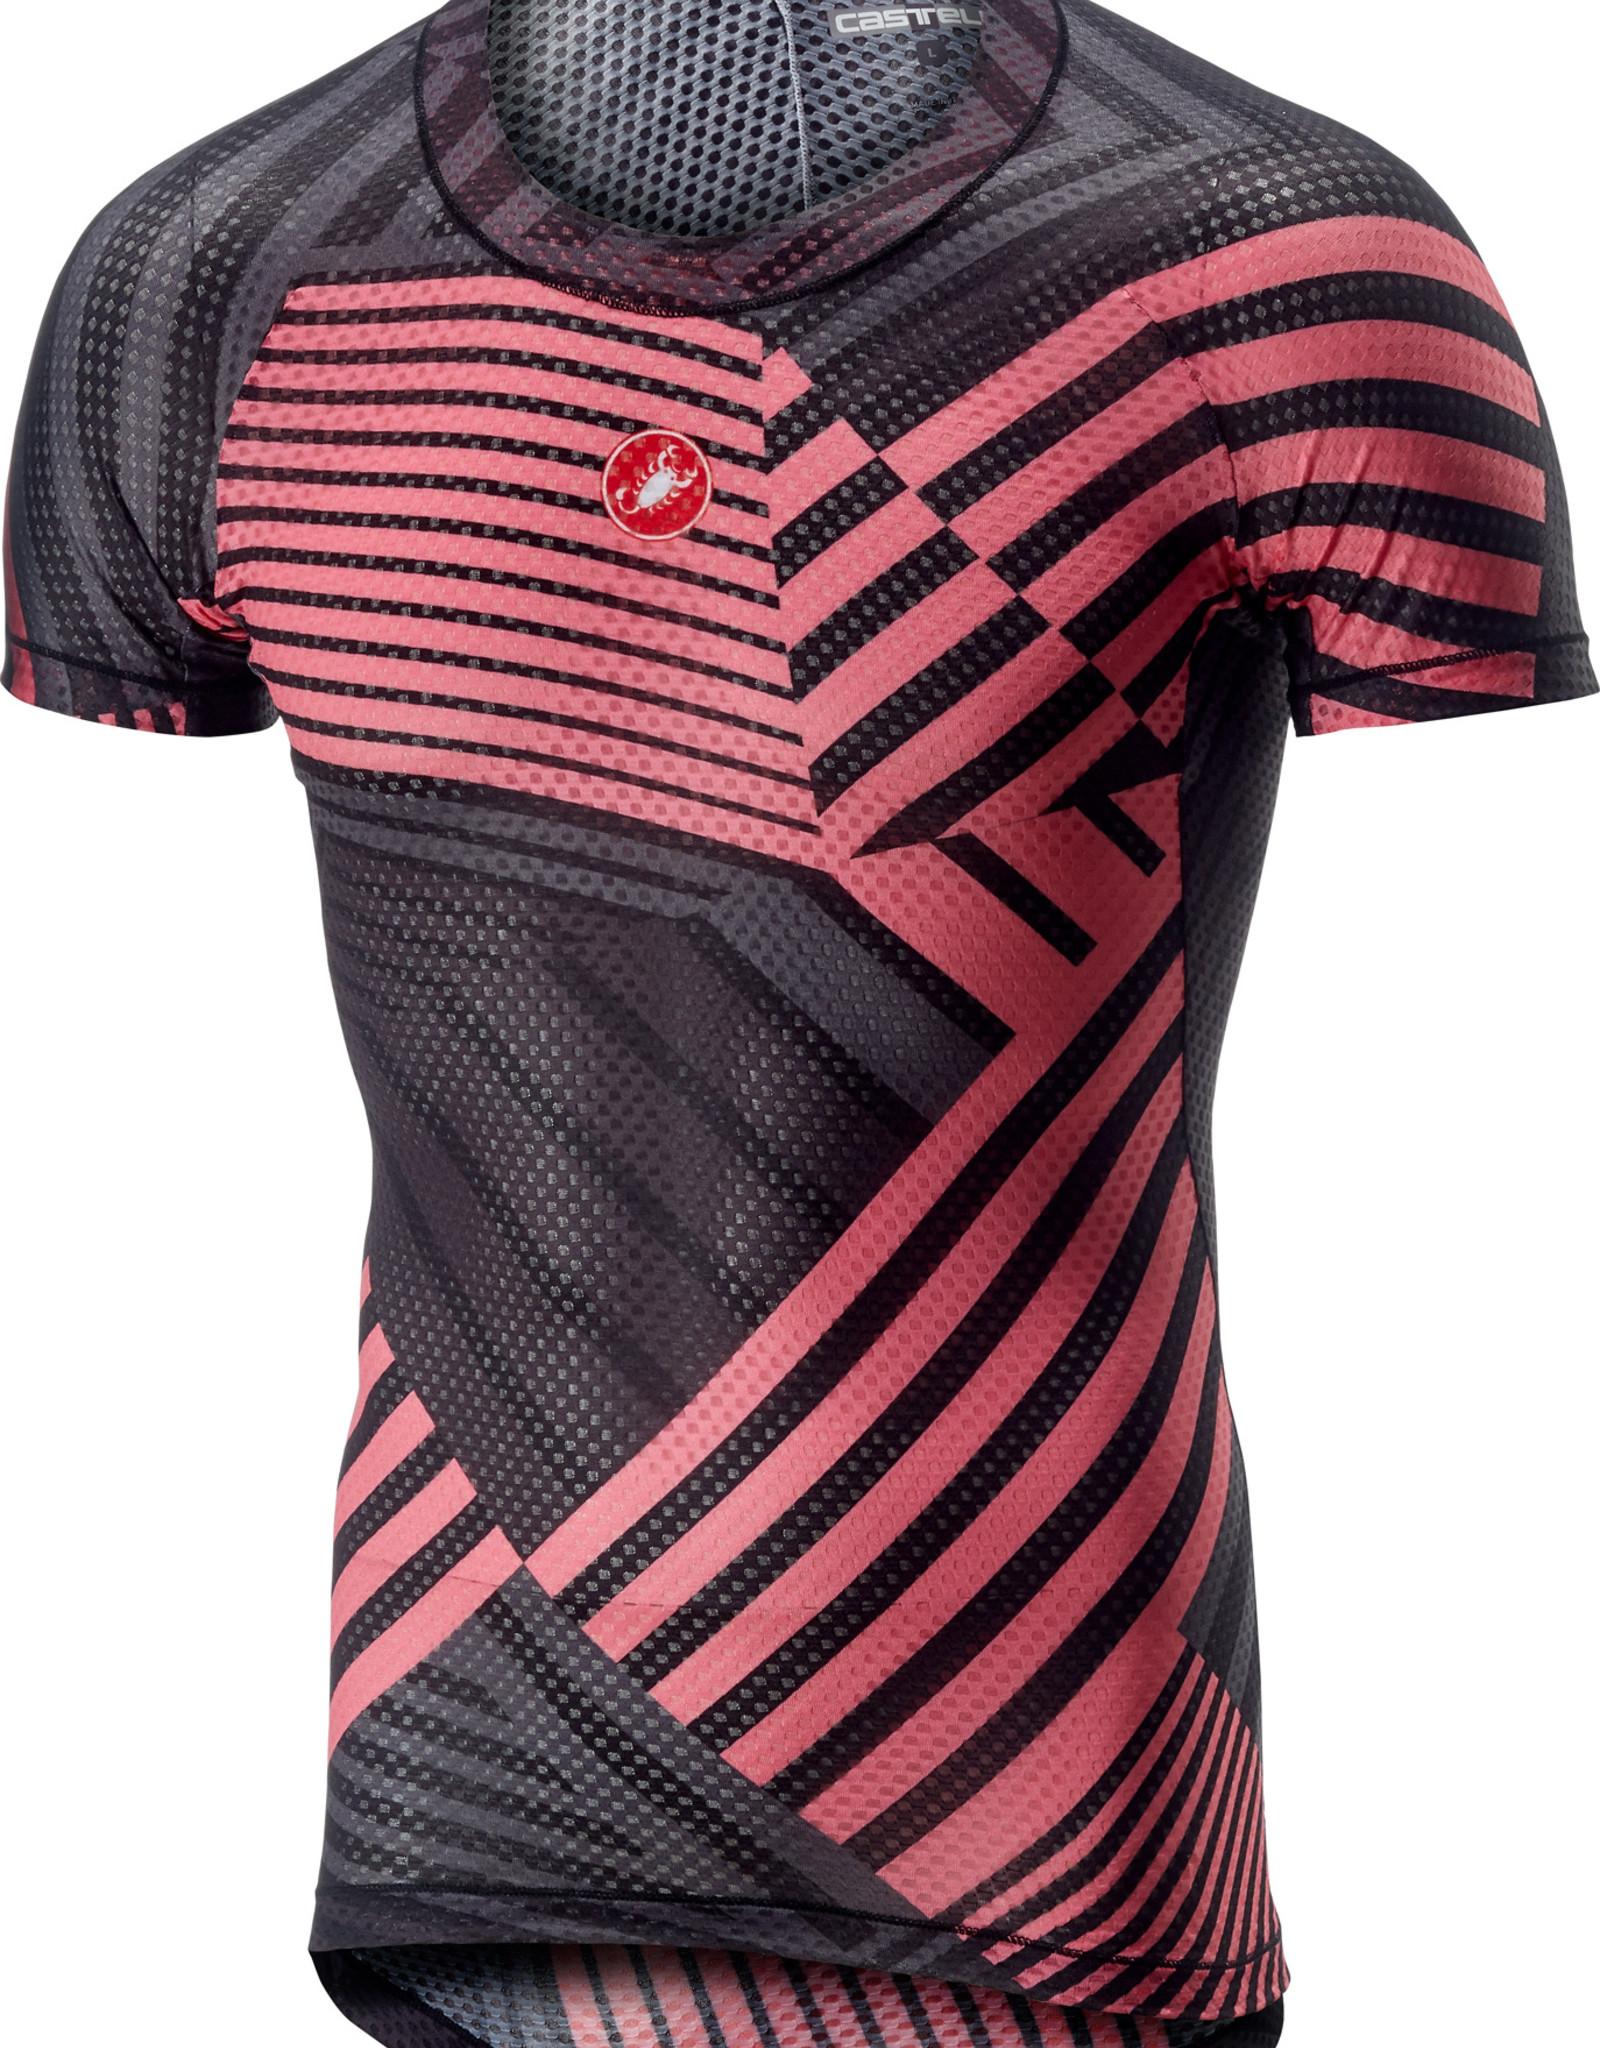 castelli Pro Mesh short sleeve 09/4519021